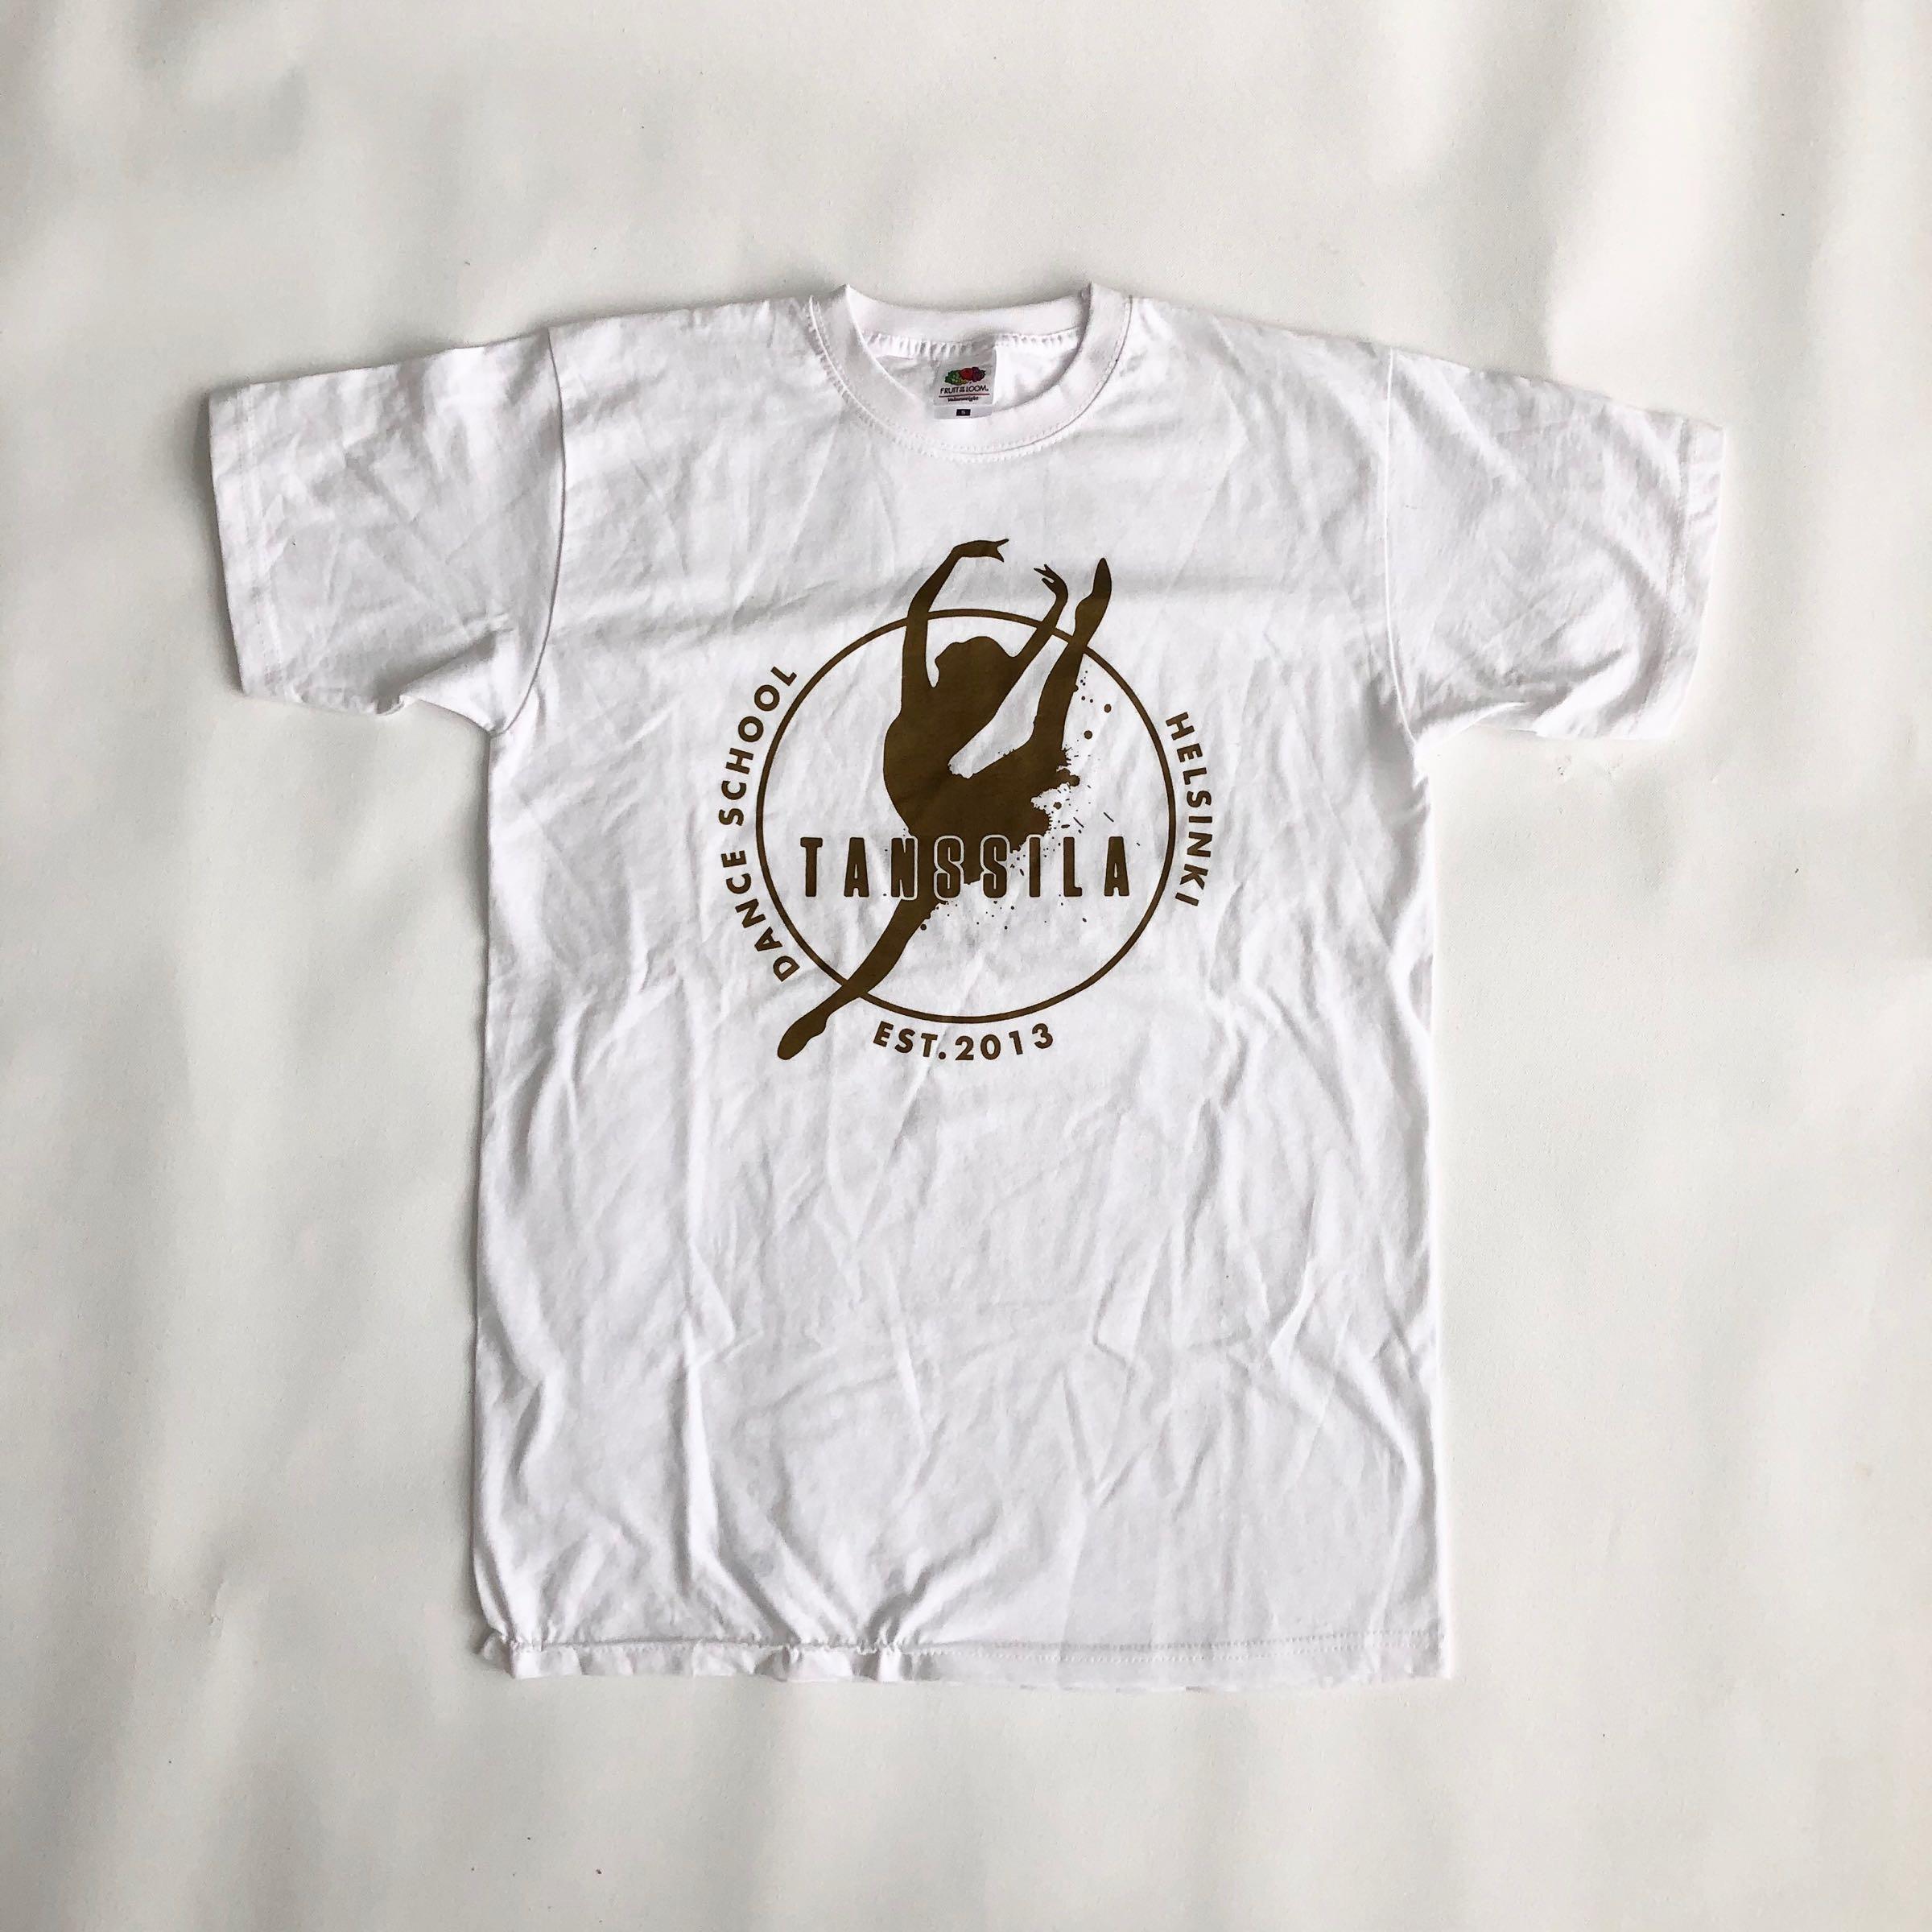 Tanssila, 5v t-paita